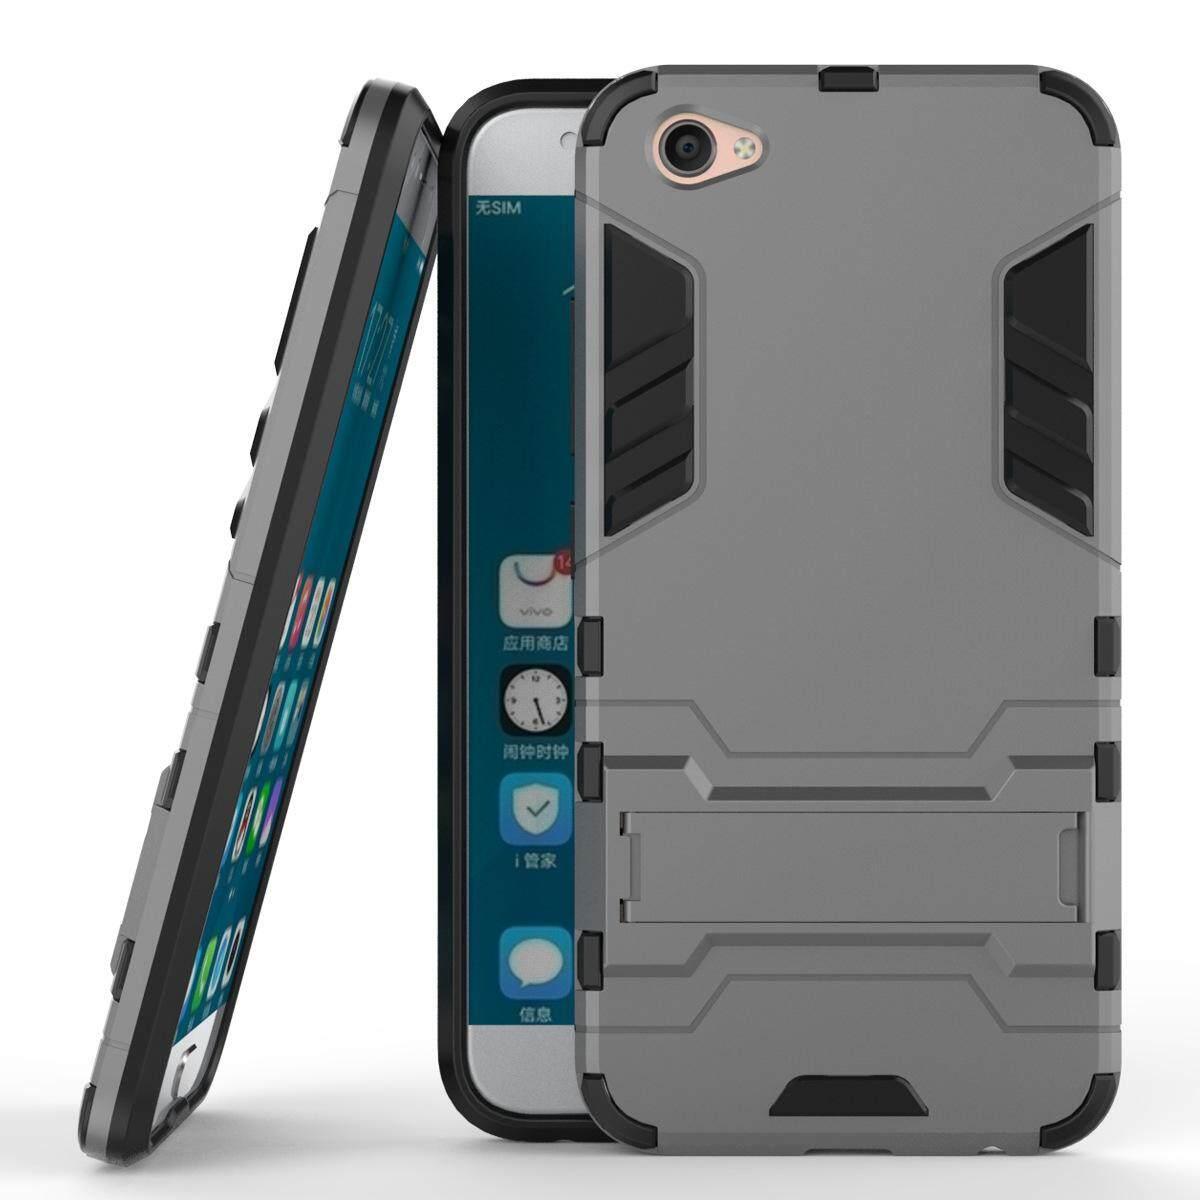 Hình ảnh for Vivo X9 & V5+ & X9S Case 2in1 PC+TPU Hybrid Slim Back Case Ultra Thin Armor Cover, with Kickstand Holder, Glossy, Minimalist, Casual